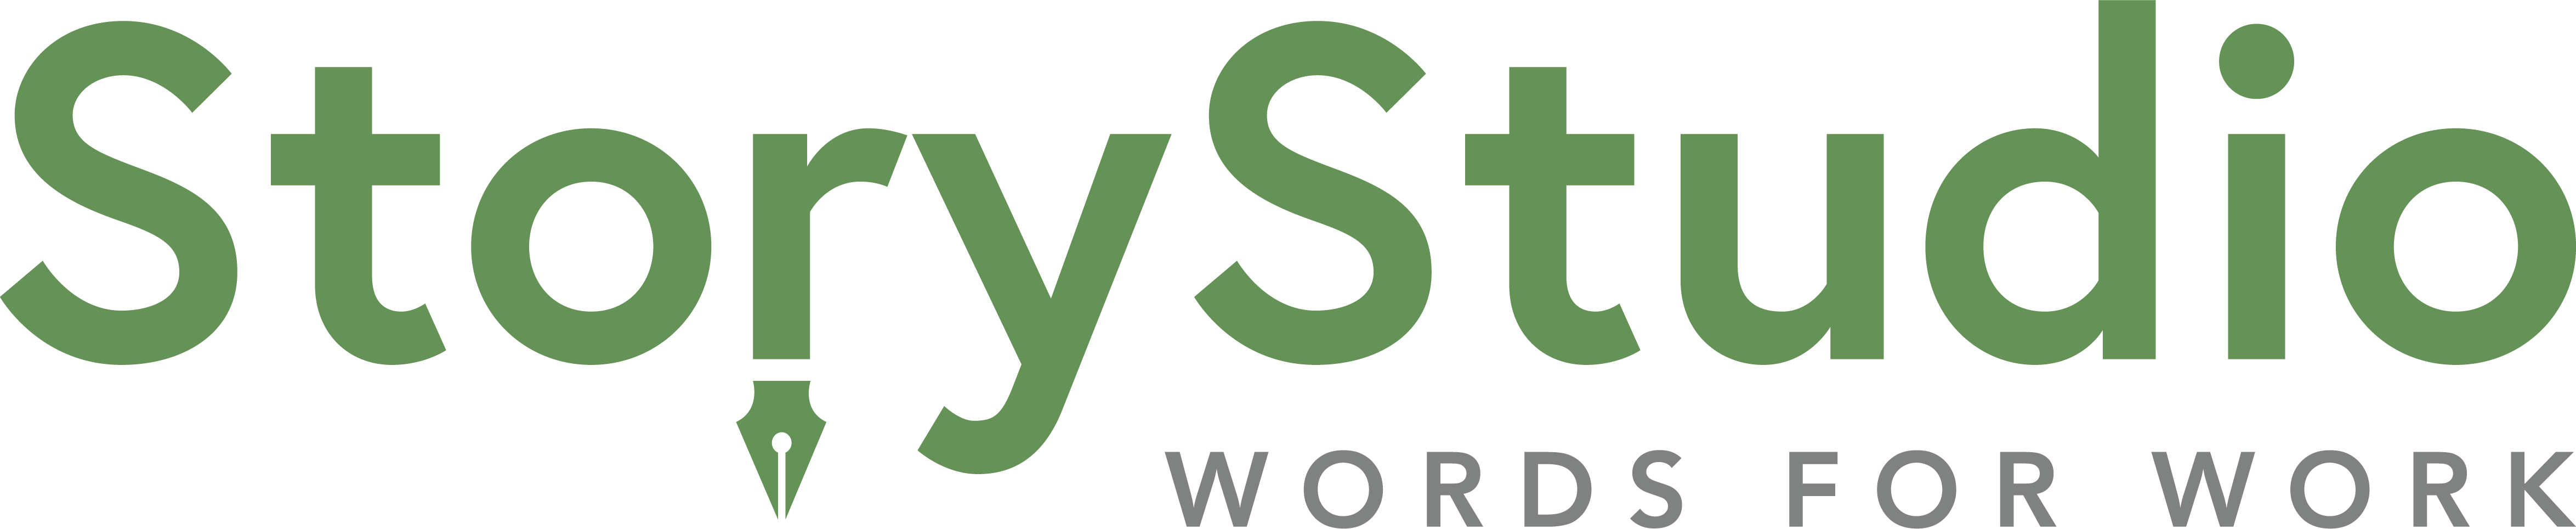 StoryStudio Words for Work